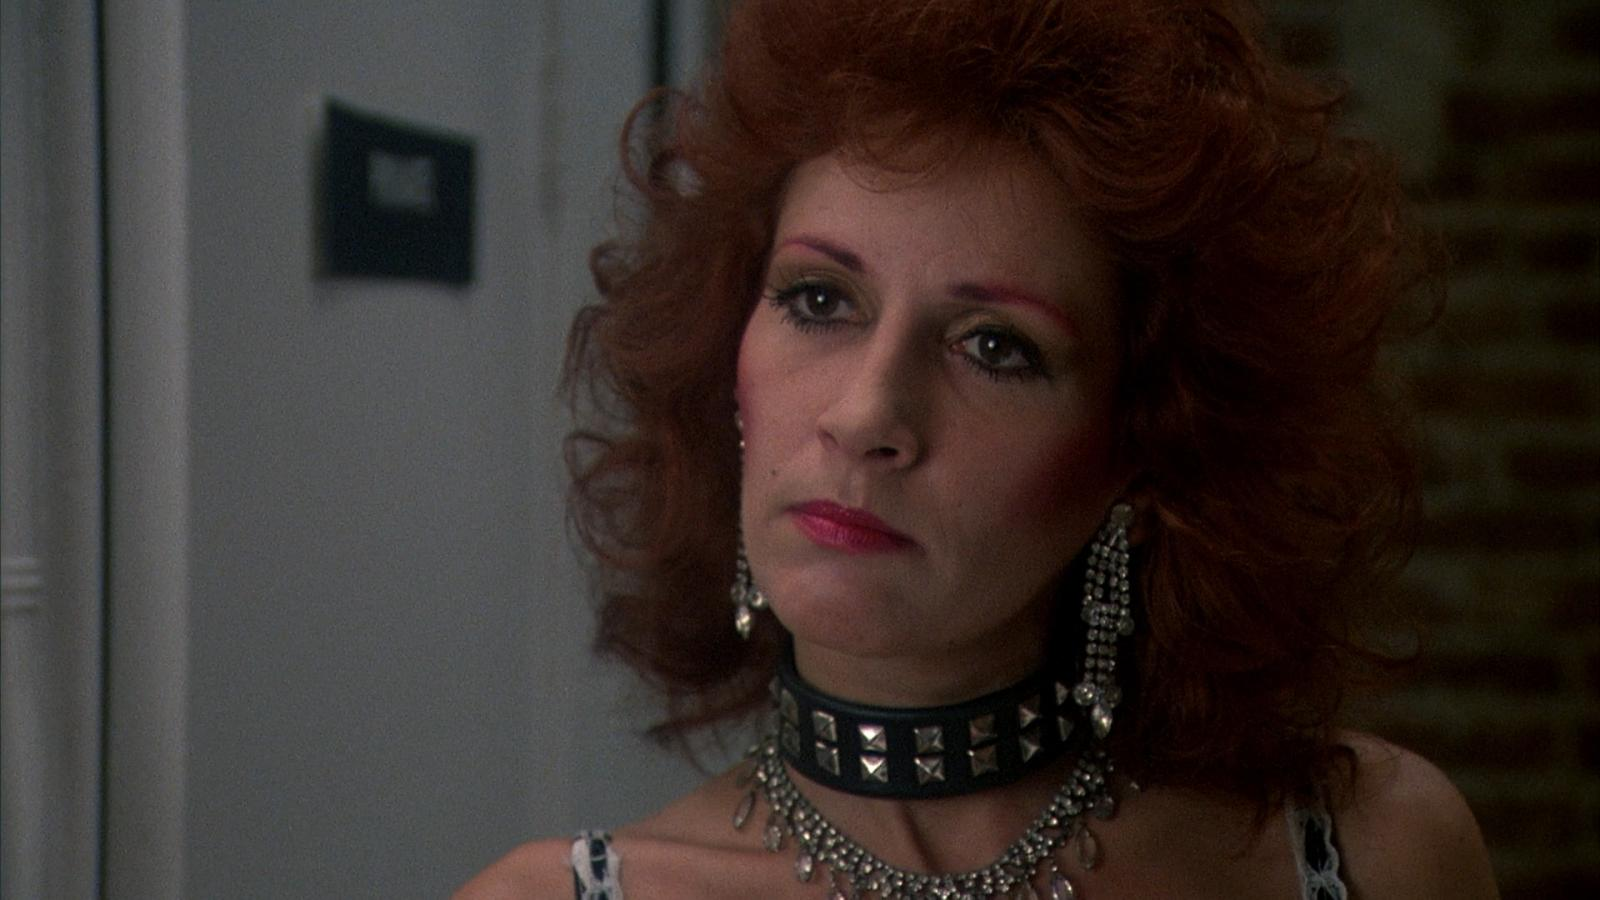 Loryn Locklin,Erich Gonzales (b. 1990) Adult archive Katrina Kaif,Peggy Hopkins Joyce